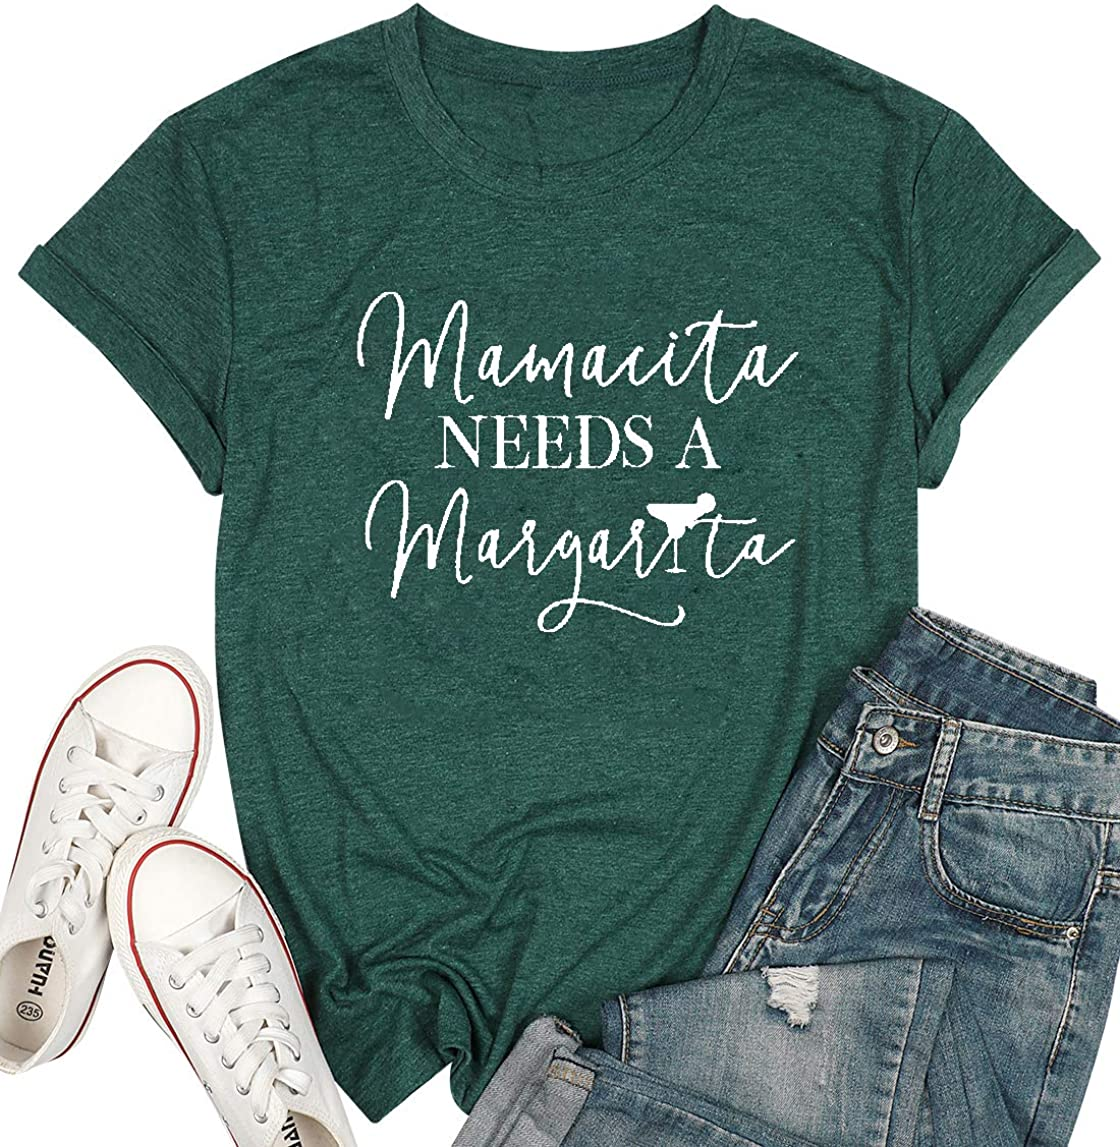 Mamacita Needs a Margarita T-Shirt Women Funny Letter Print Tees Mamacita Graphic Casual Top Shirt